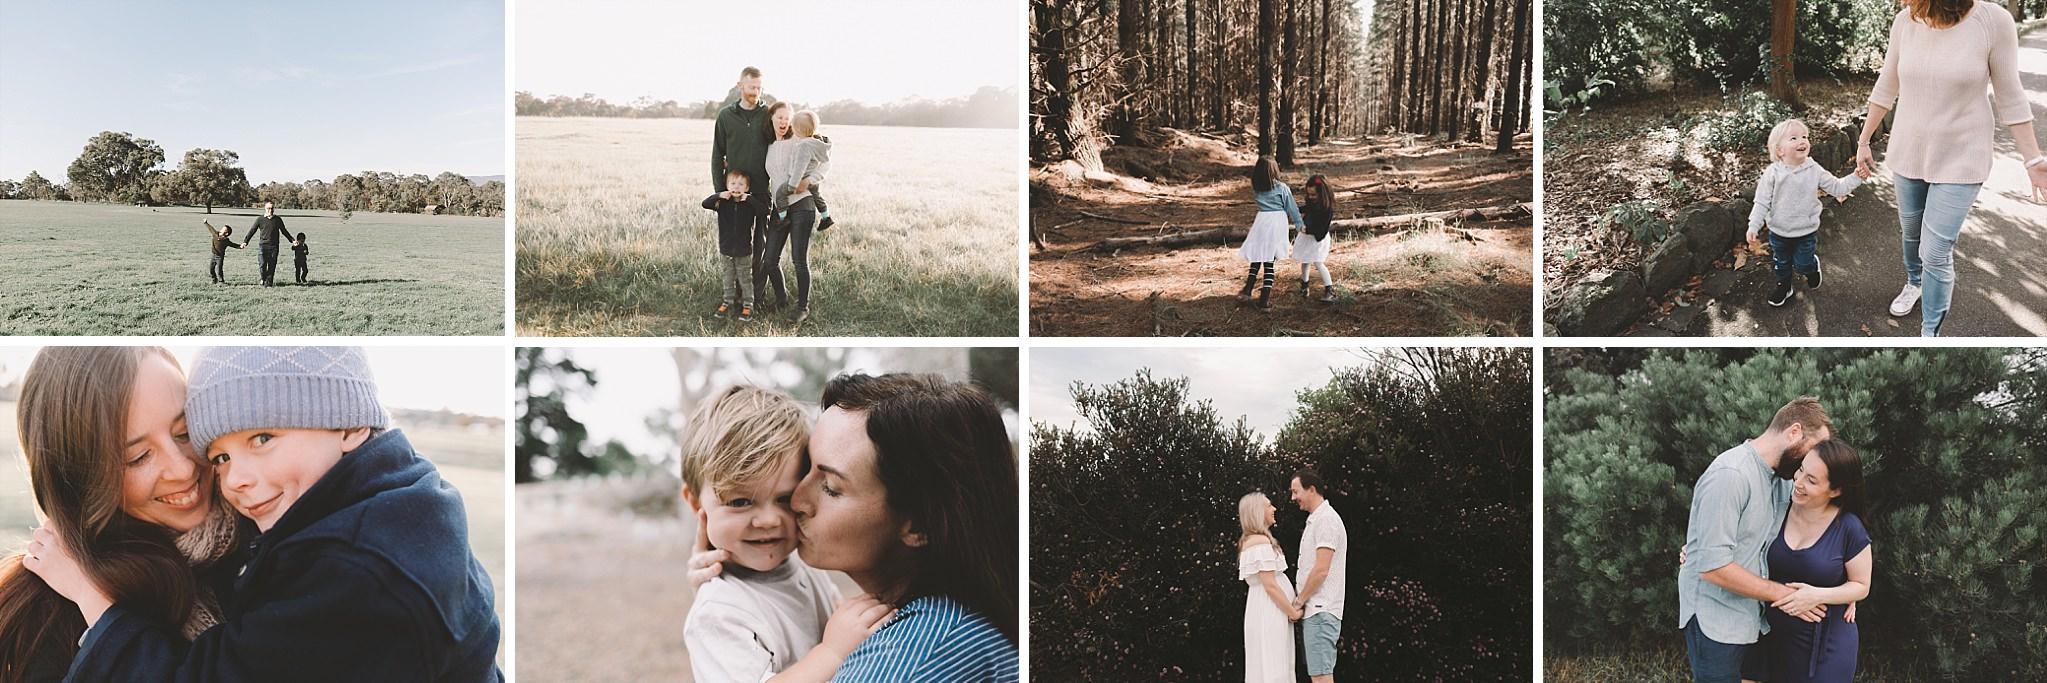 Lecinda Ward, Melbourne Family Newborn and Wedding Photographer_0106.jpg